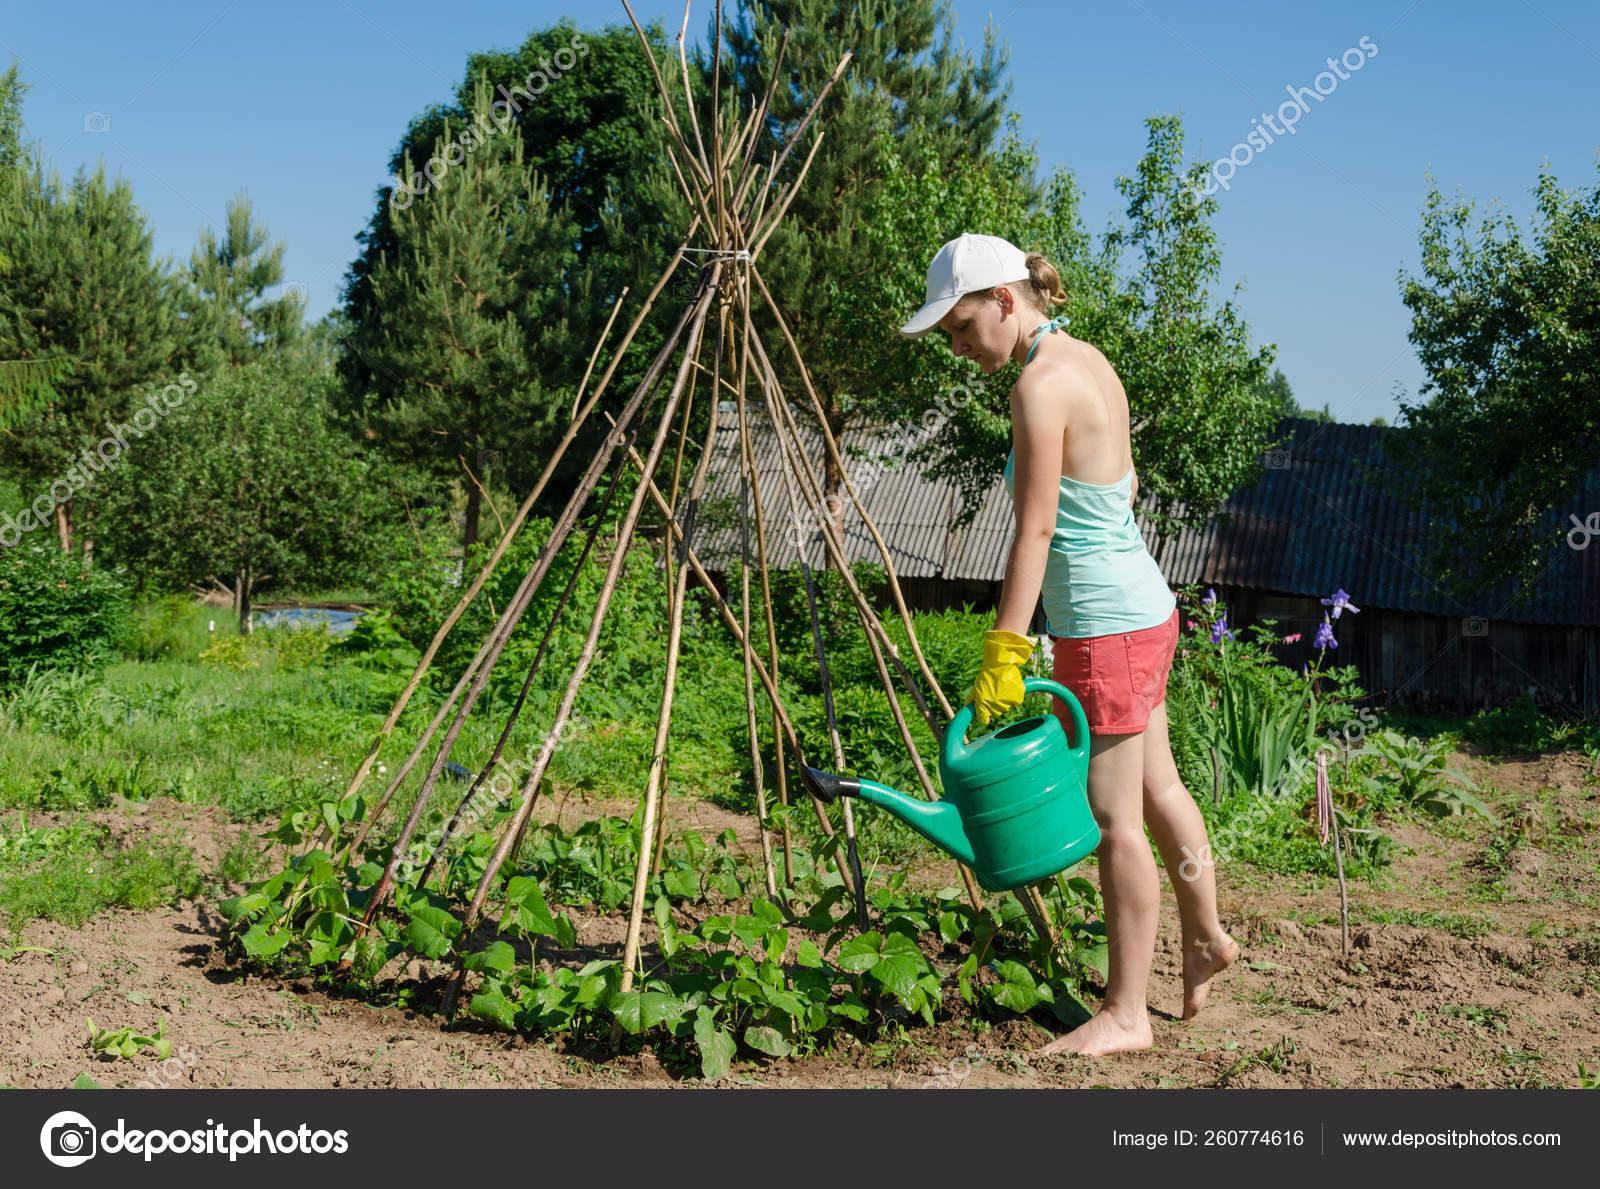 https://st4.depositphotos.com/20524830/26077/i/1600/depositphotos_260774616-stock-photo-girl-garden-watering-can-goes.jpg